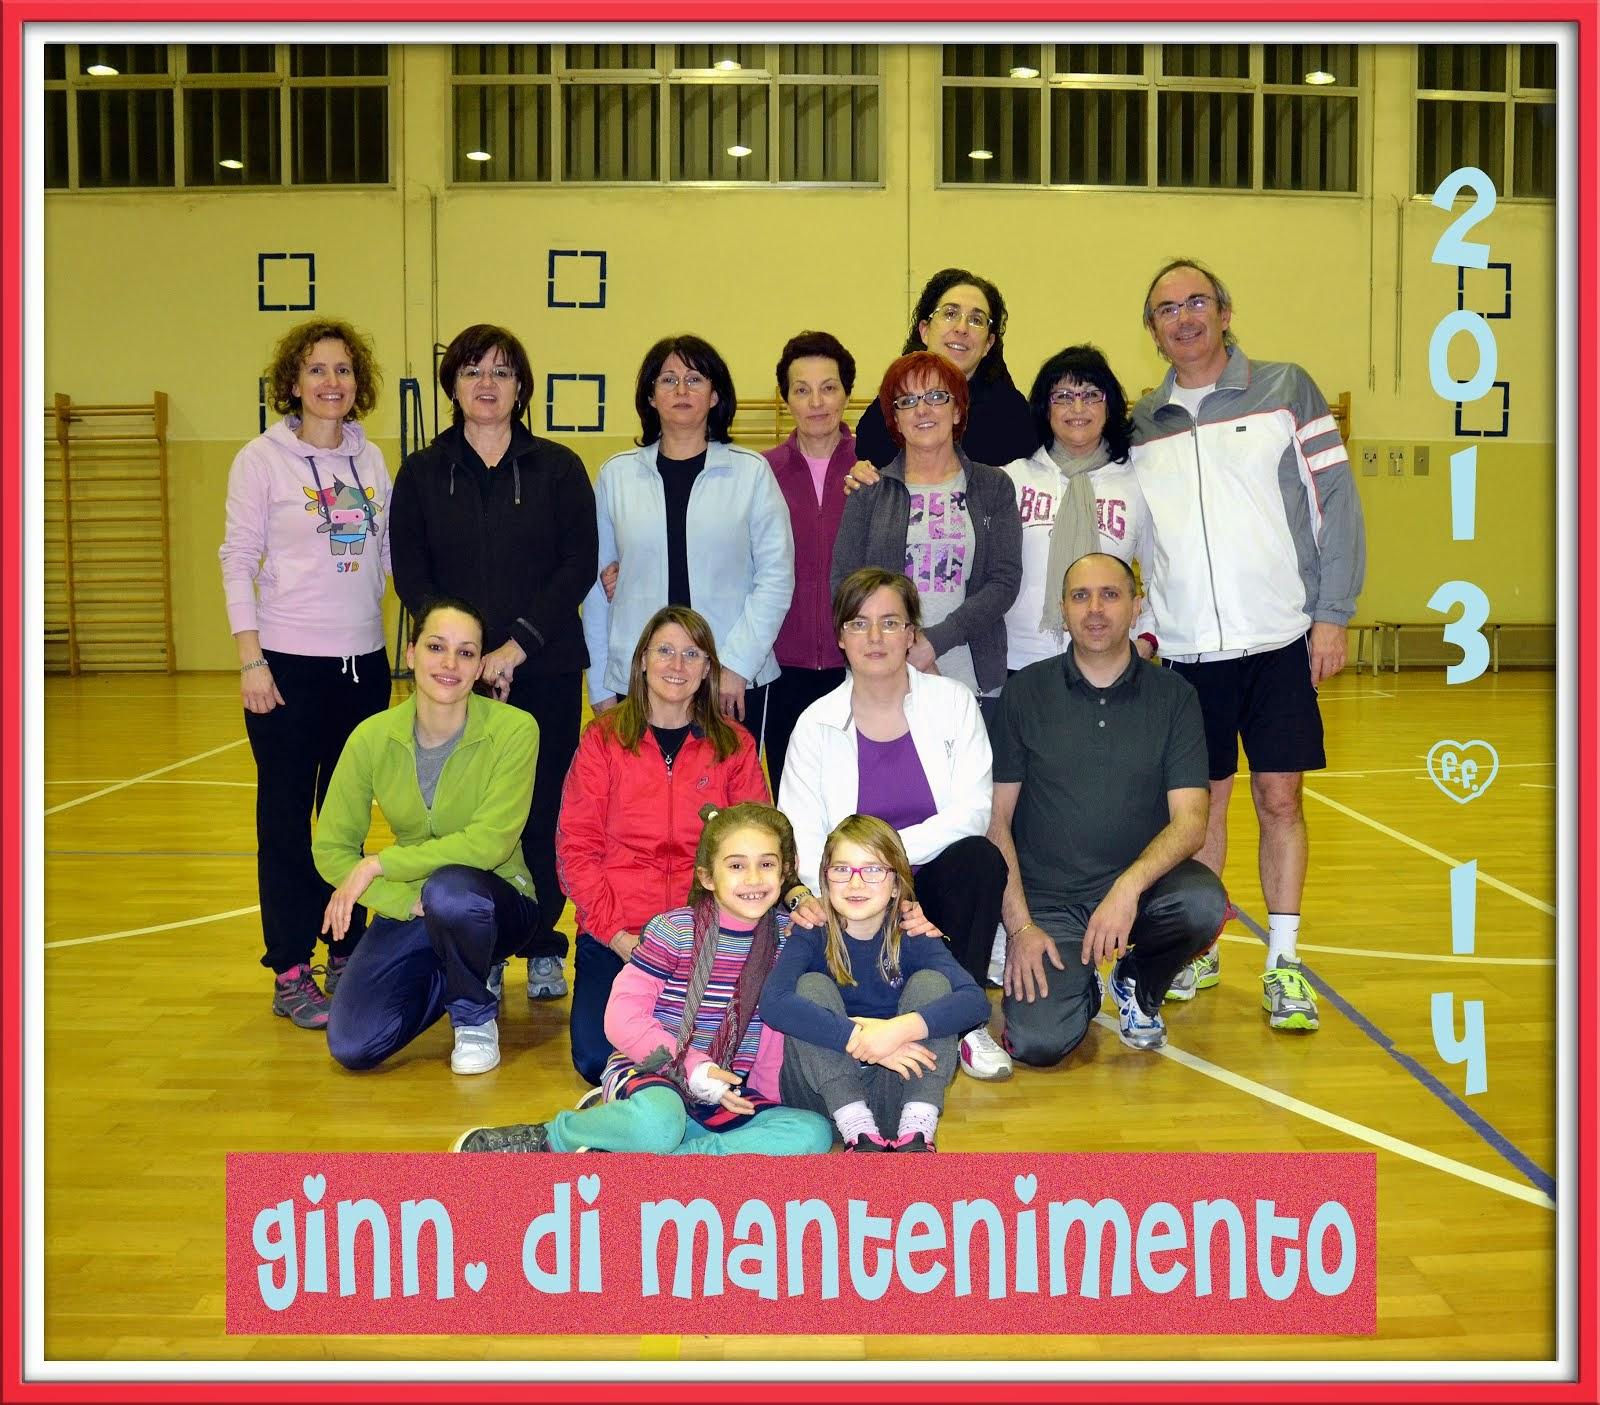 Ginn. di Mantenimento 2013/14